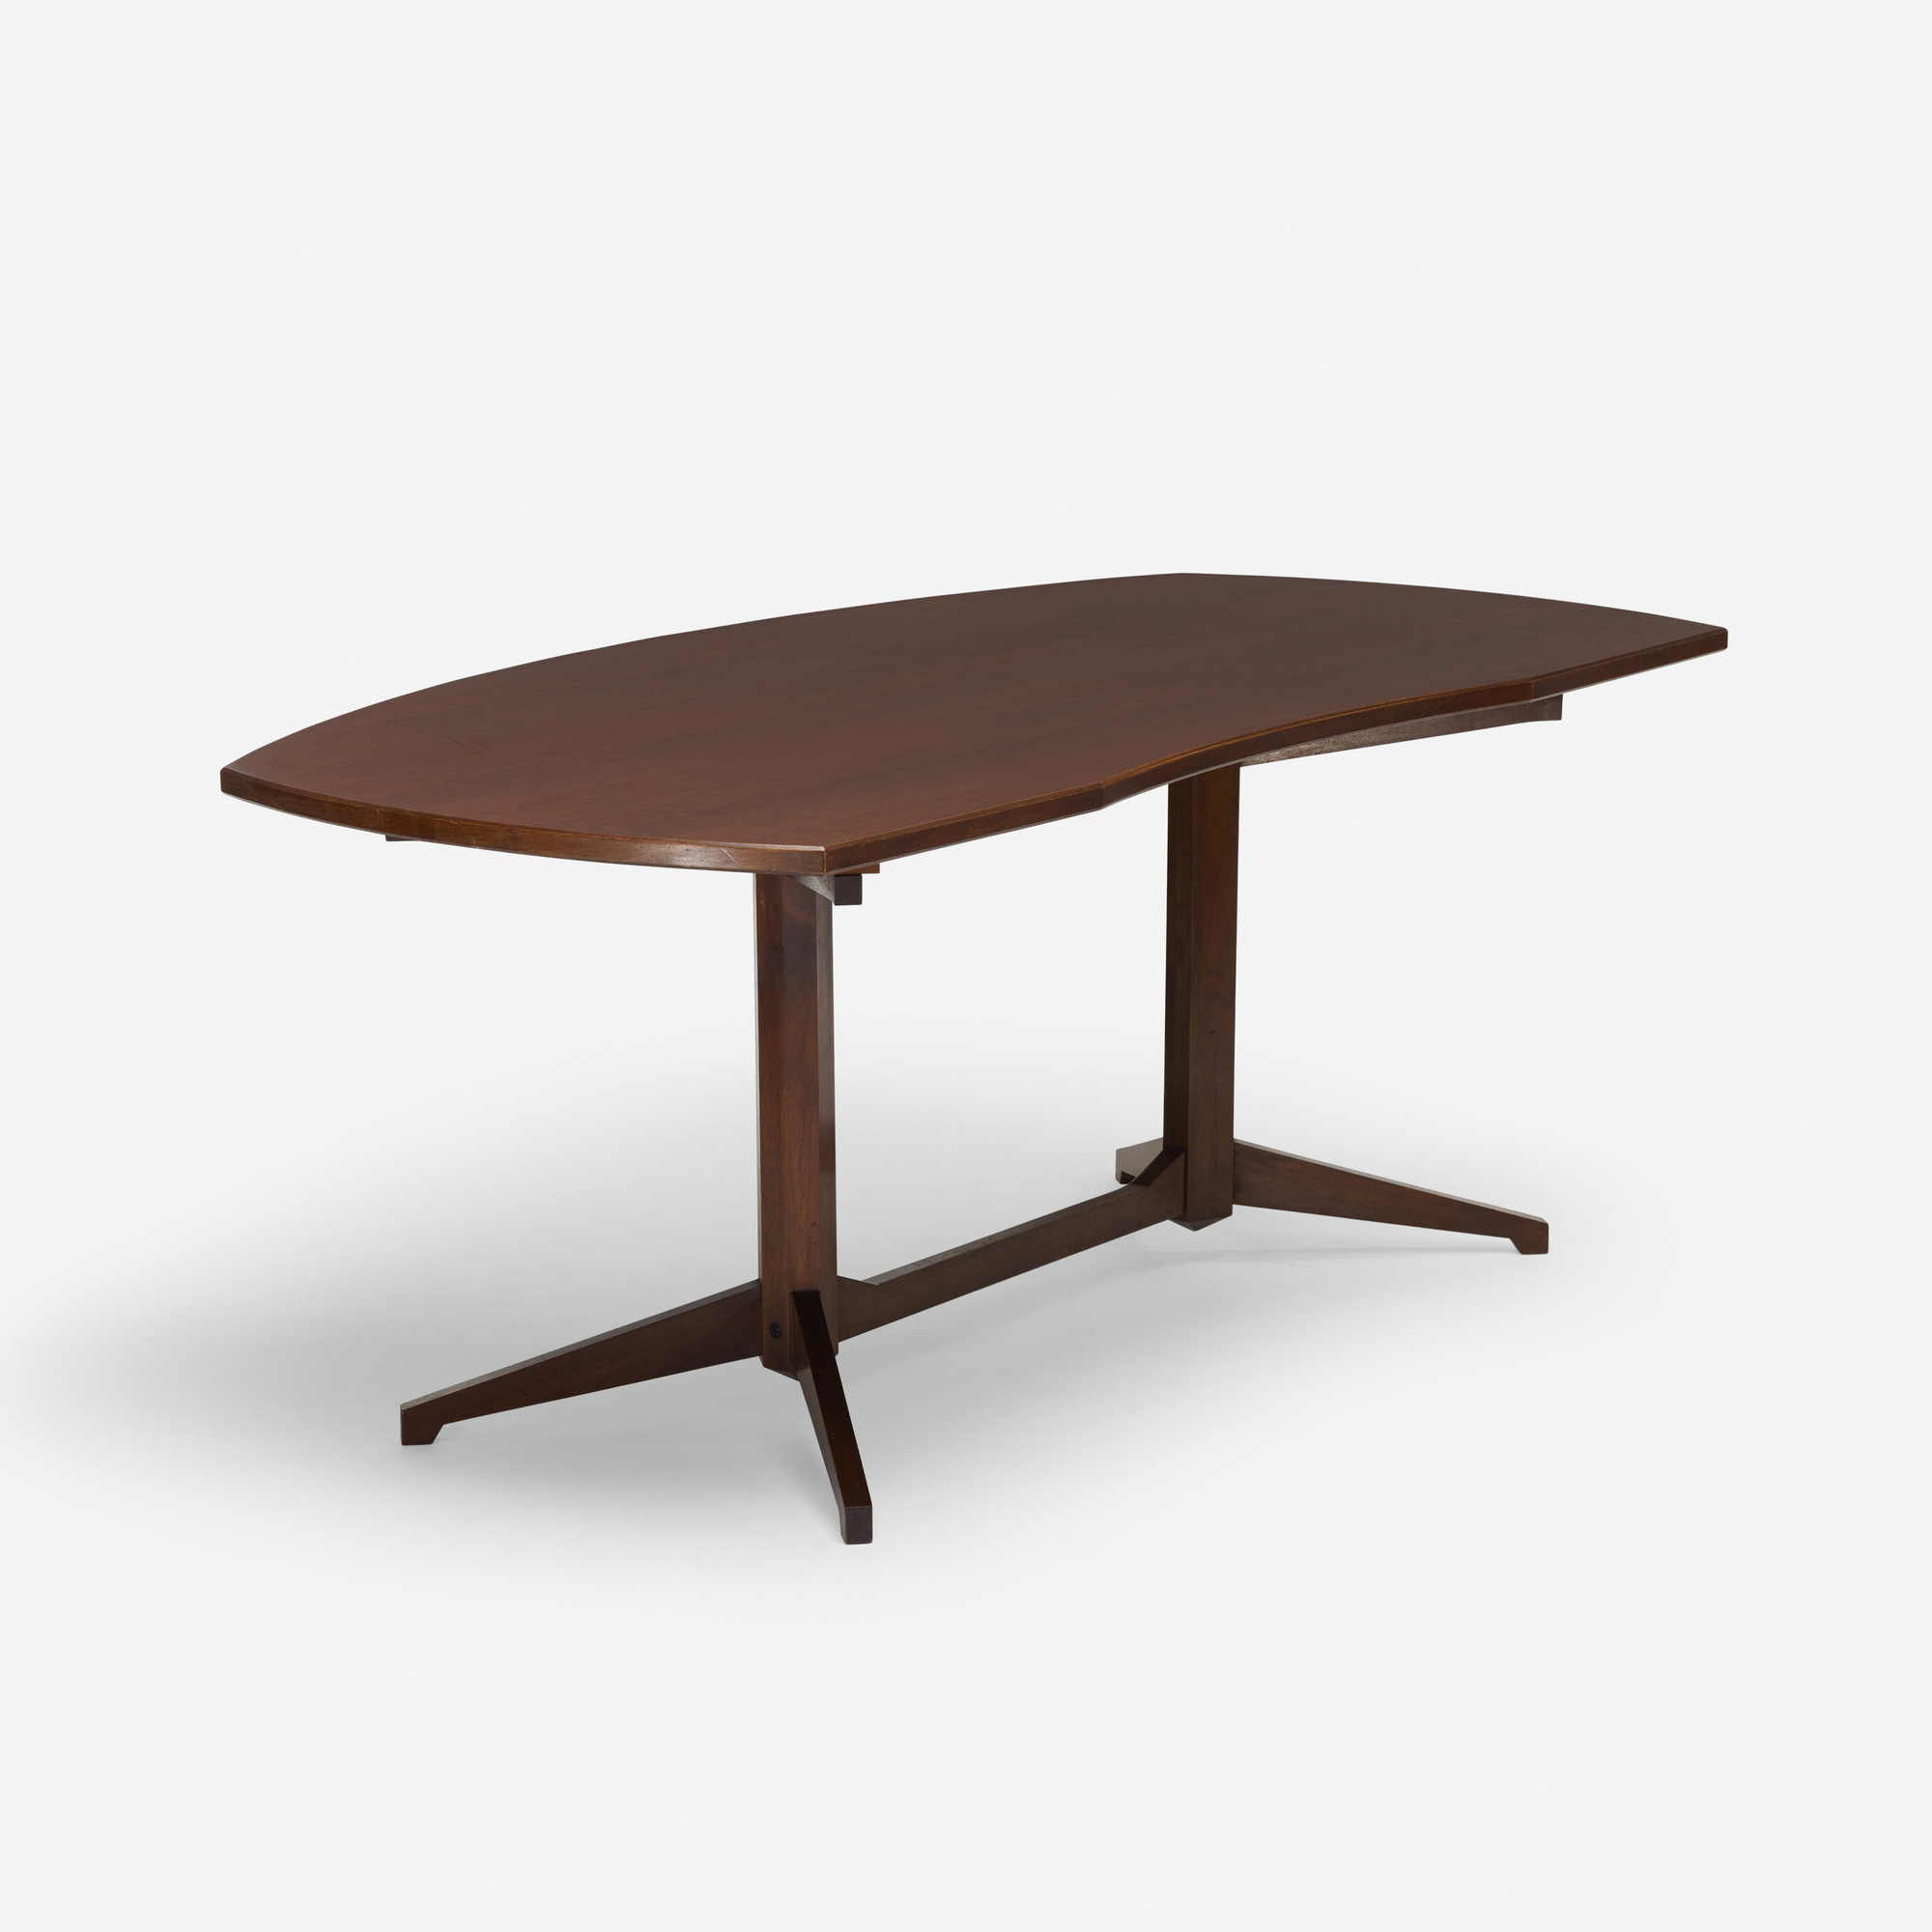 308: Franco Albini and Franca Helg / desk, model TL 22 (2 of 2)